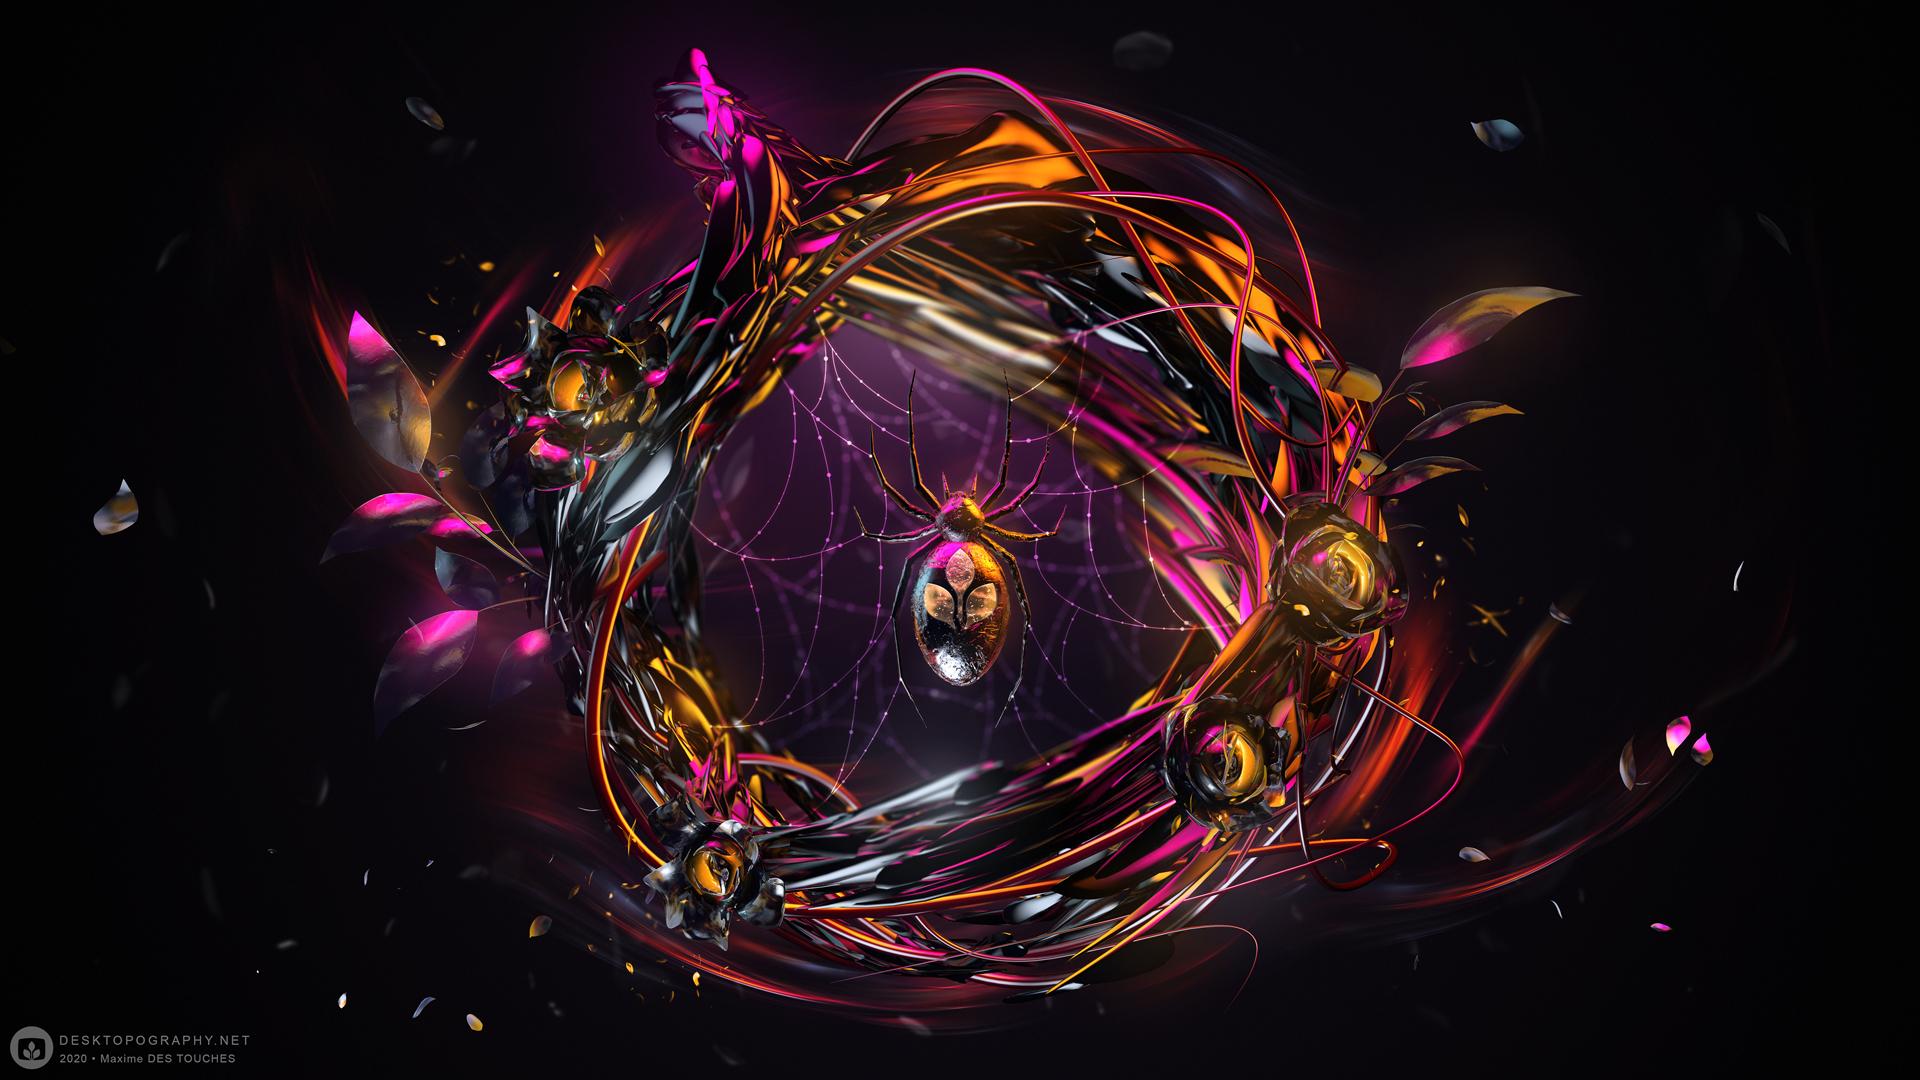 Digital art news,, Arachnida wallpaper Desktopography 2020. Maxime des Touches elreviae